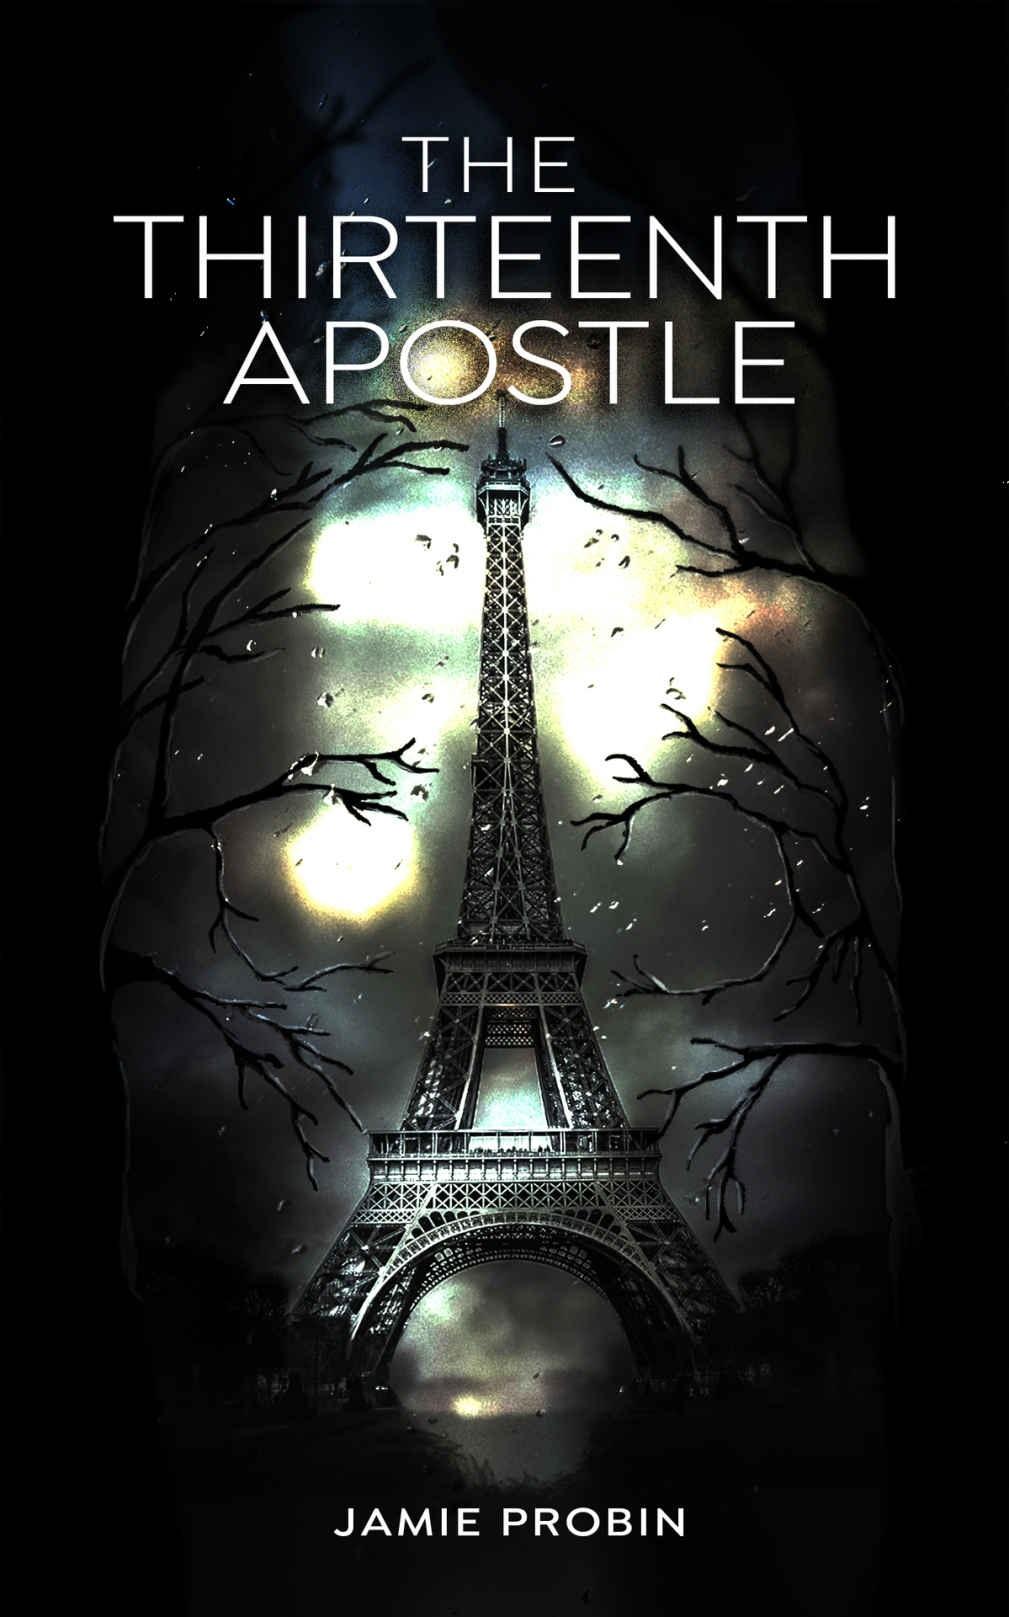 Thirteenth Apostle, The